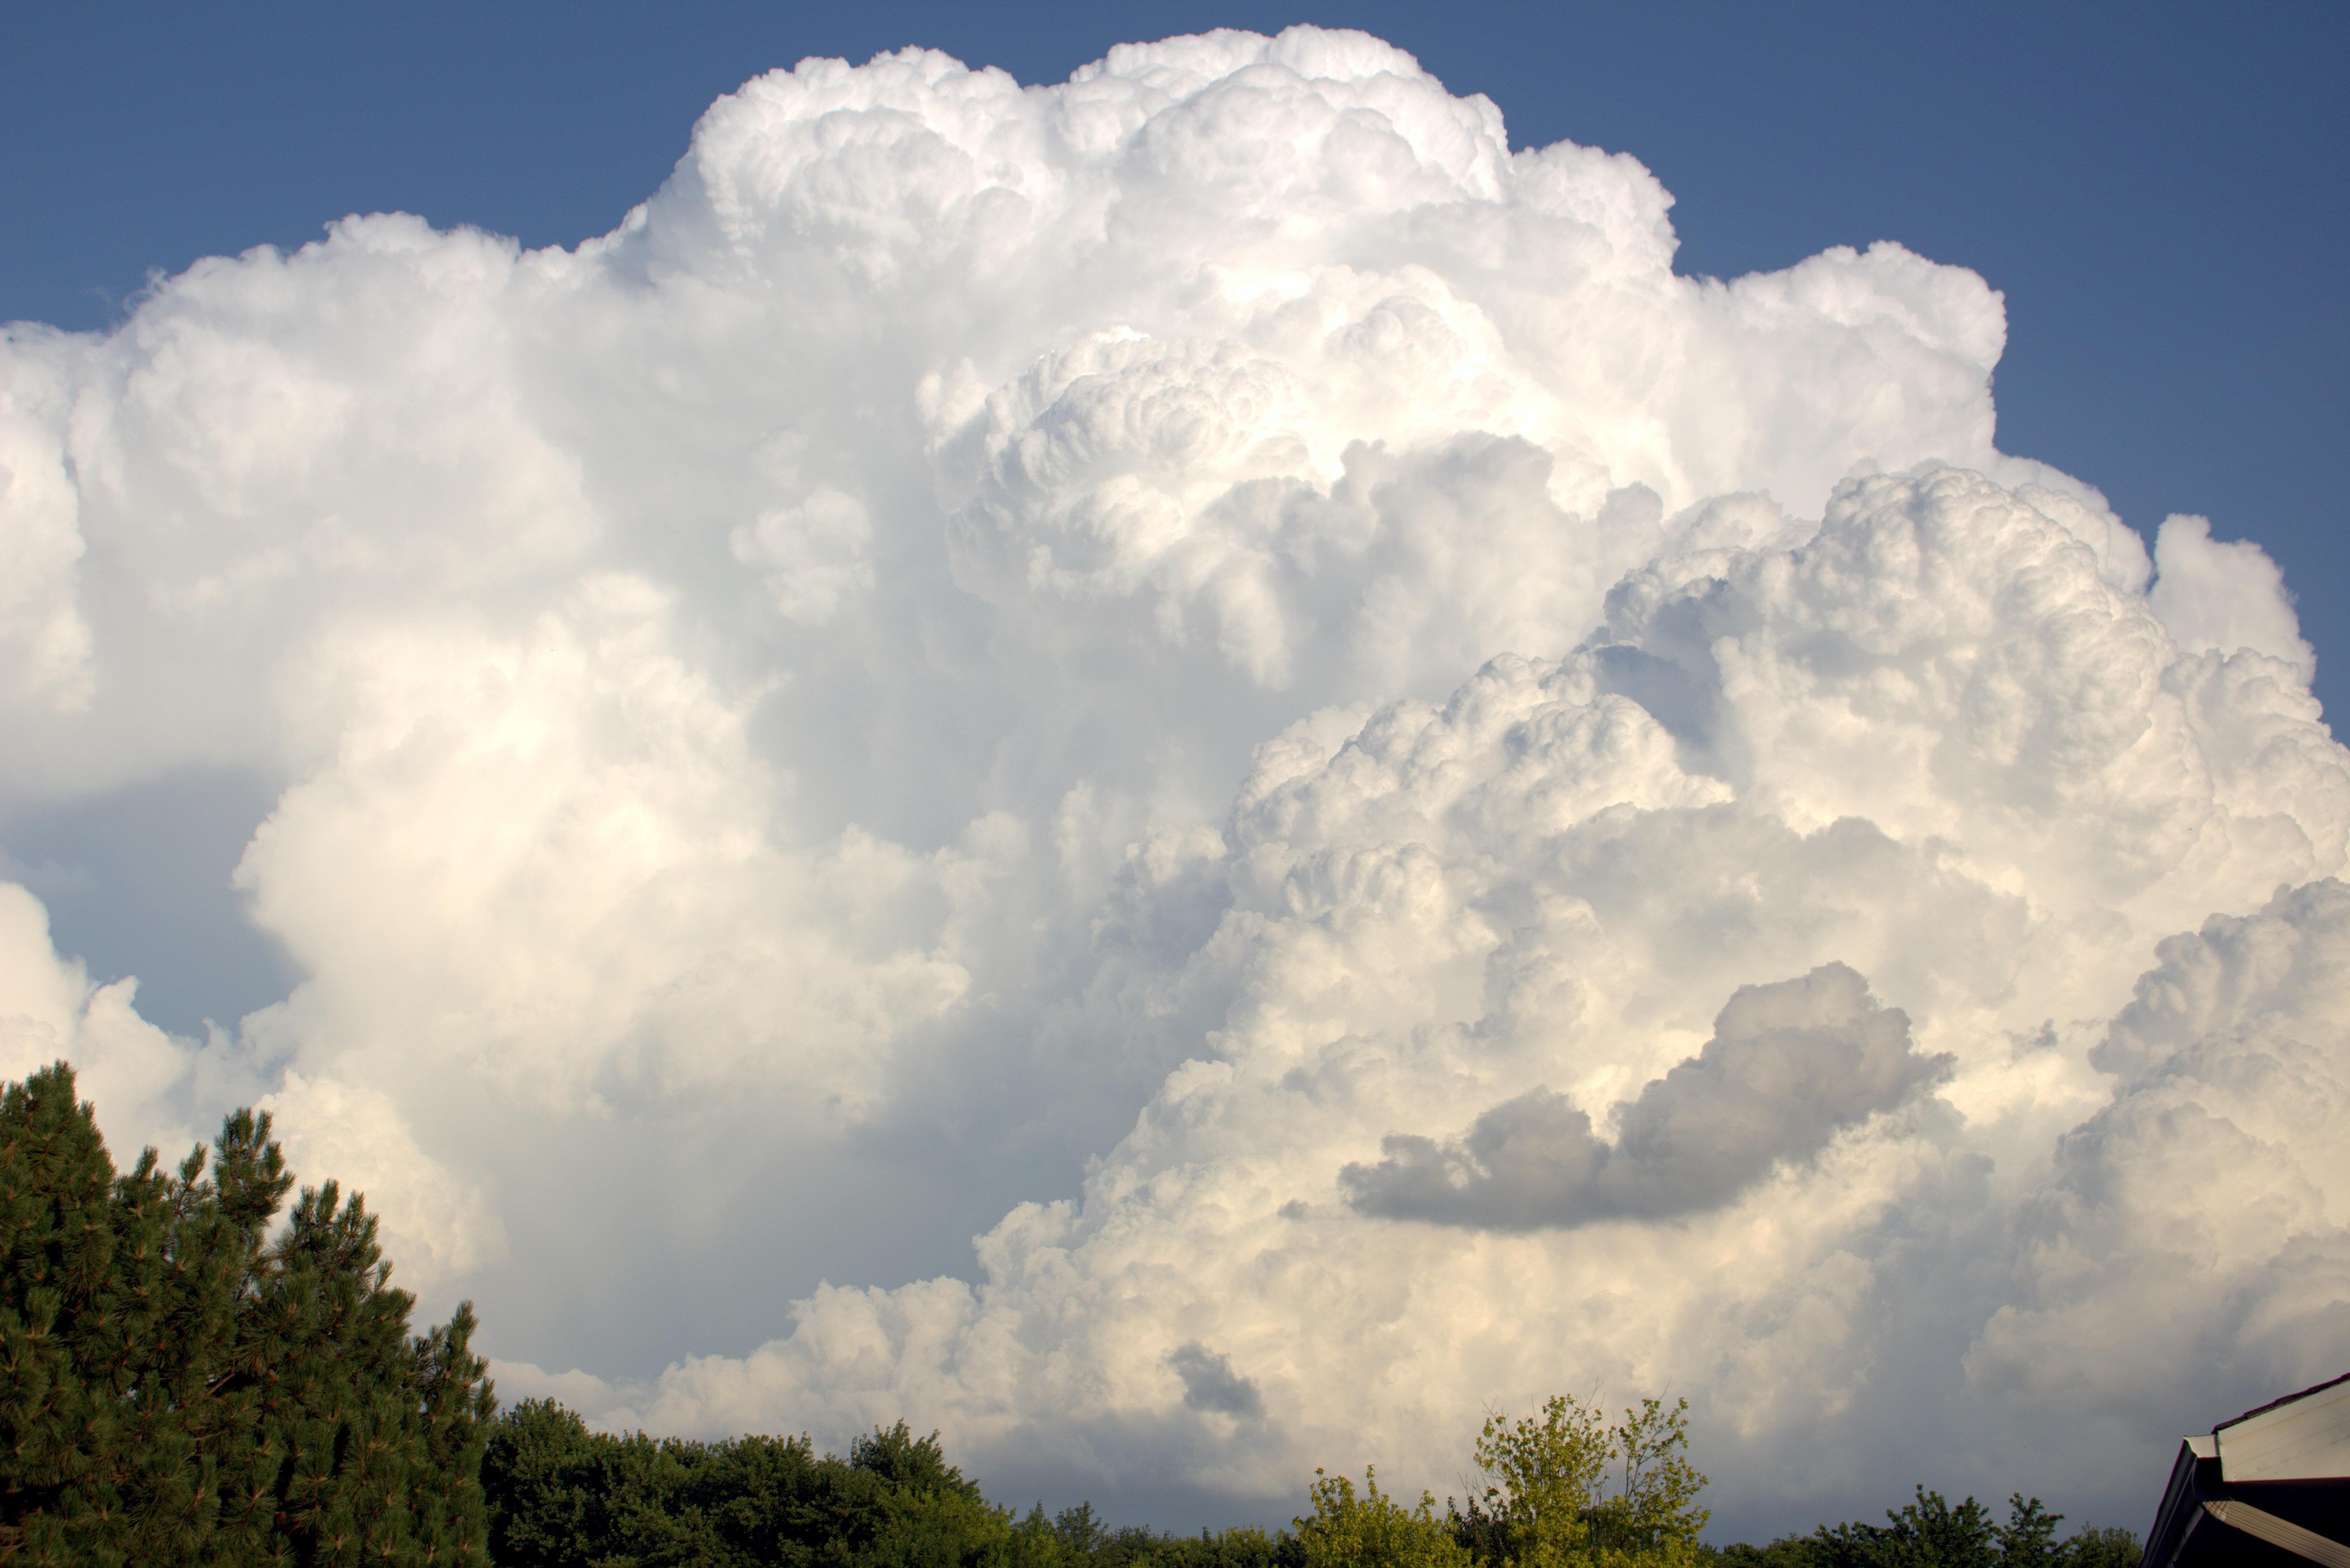 неброский, картинки мелкие облака то